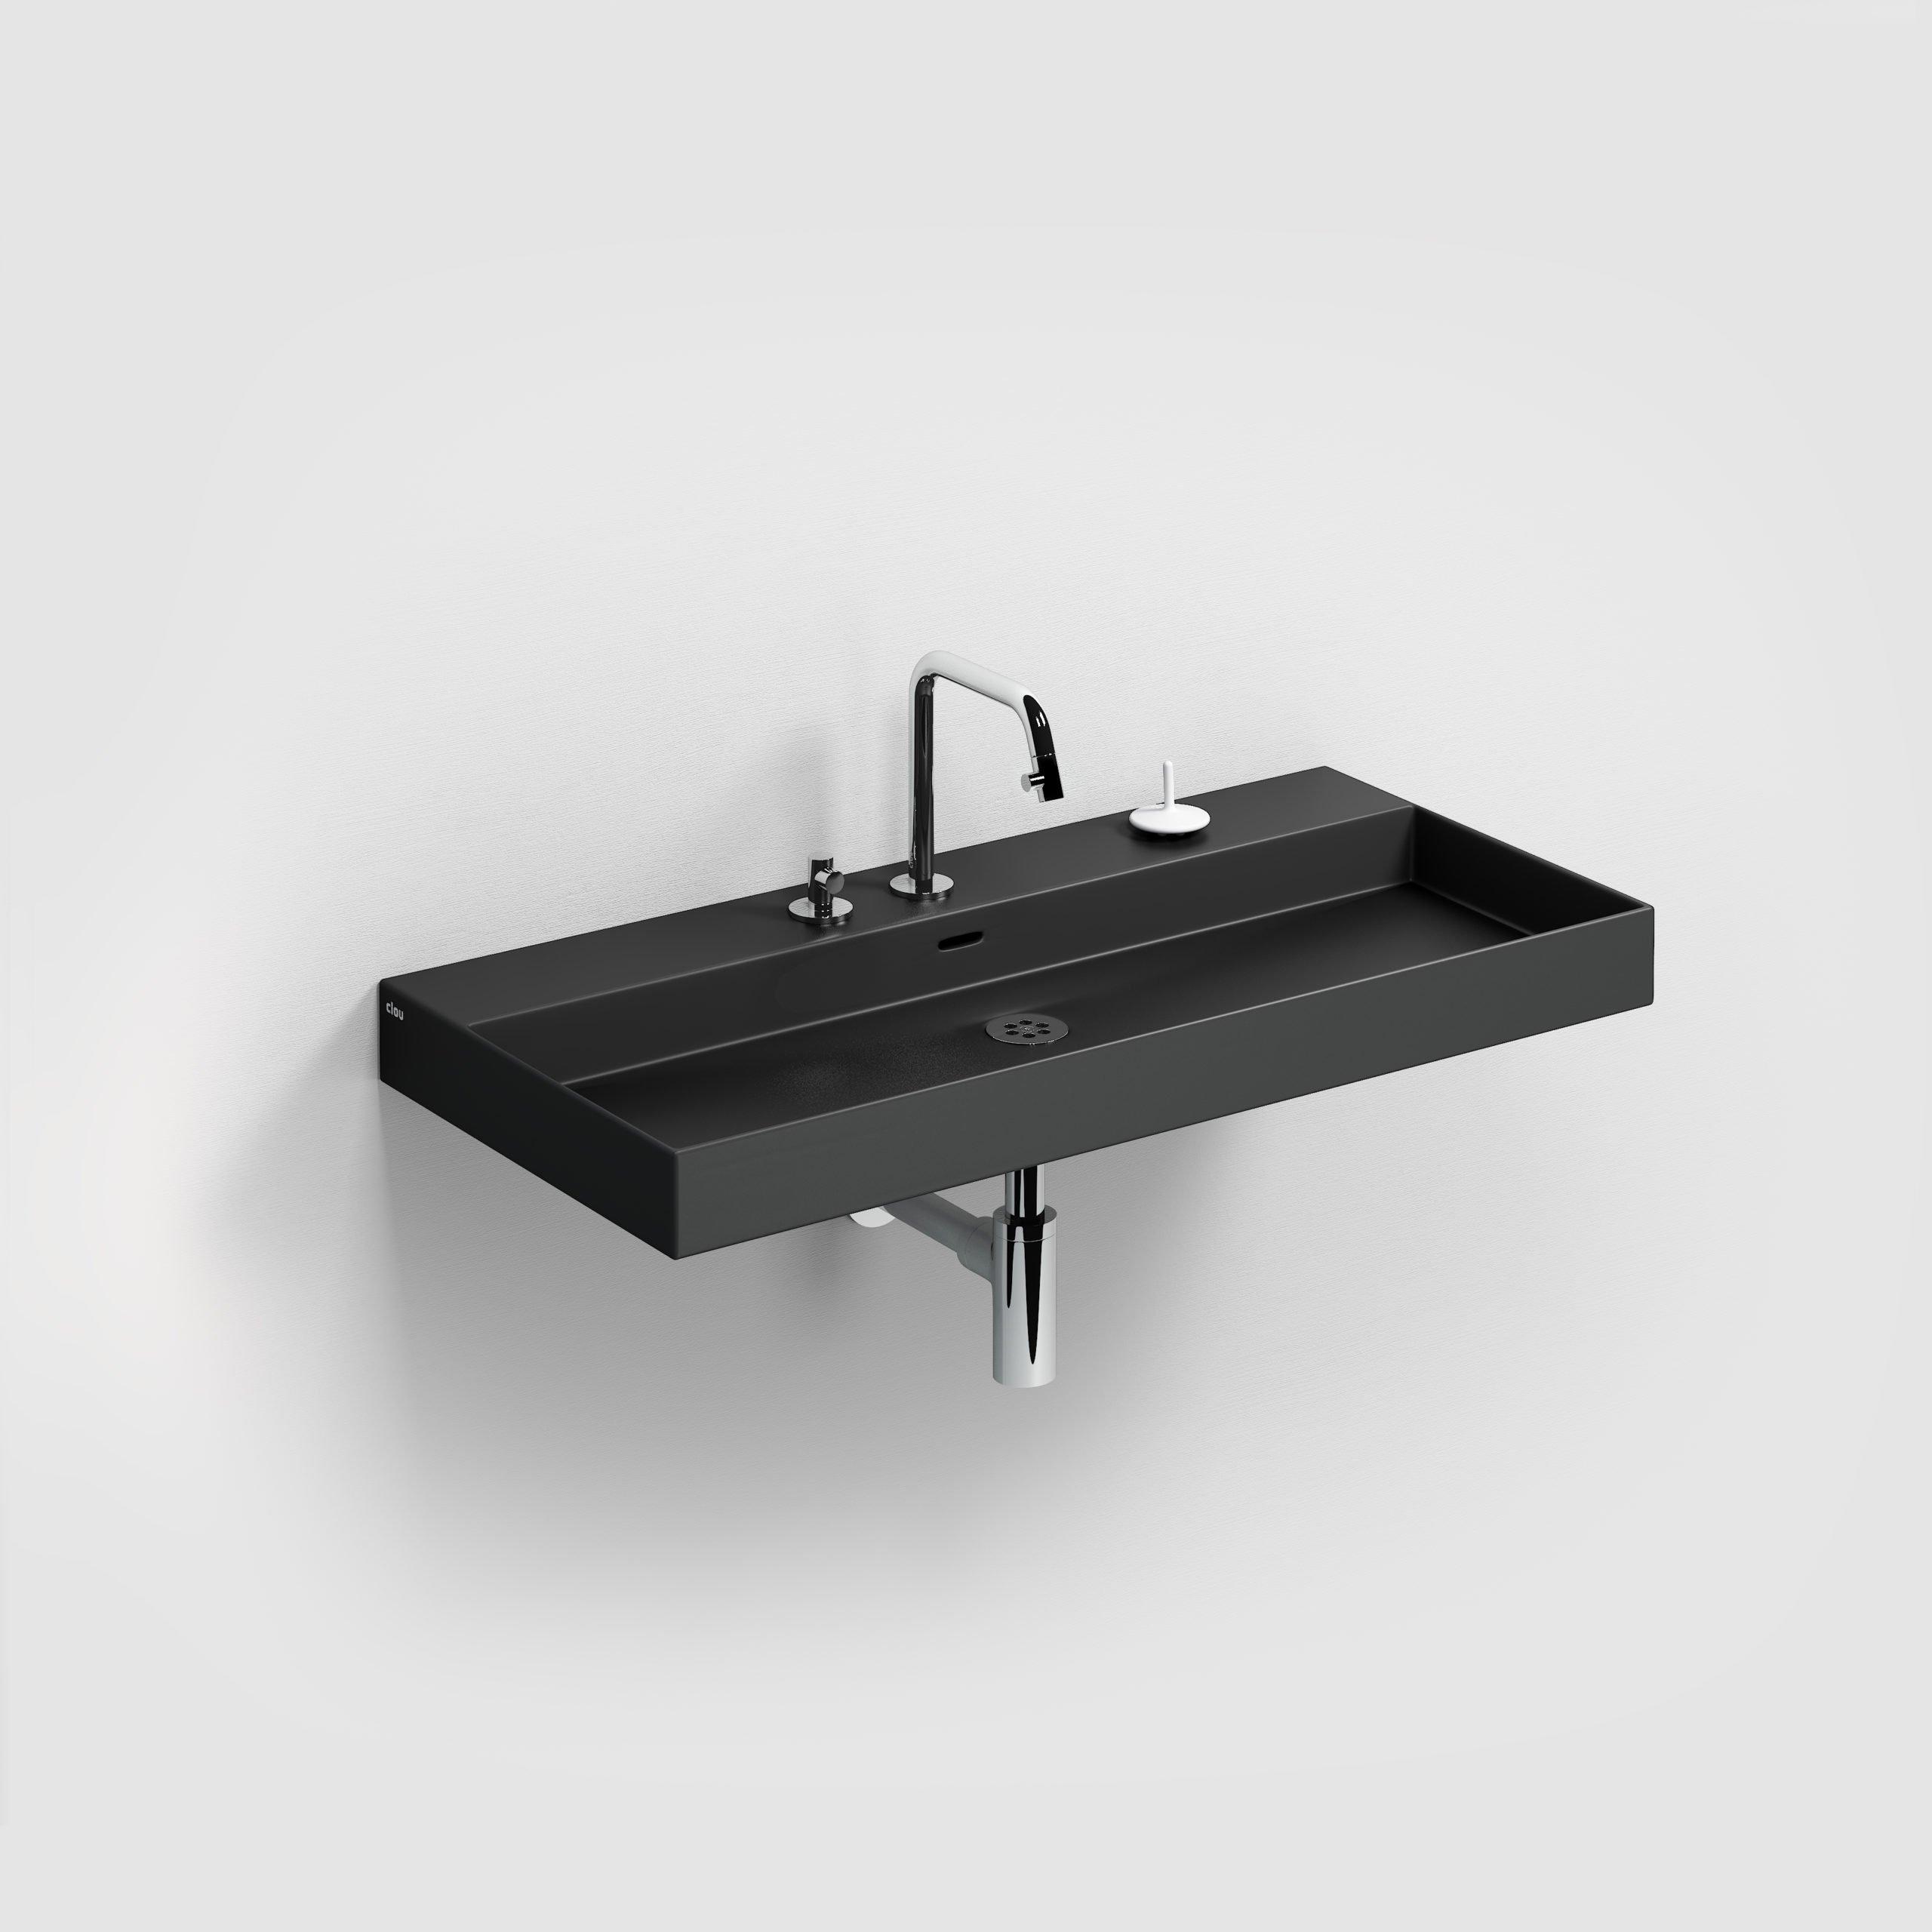 Clou New Wash Me wastafel 90cm, zonder plug, mat zwart keramiek